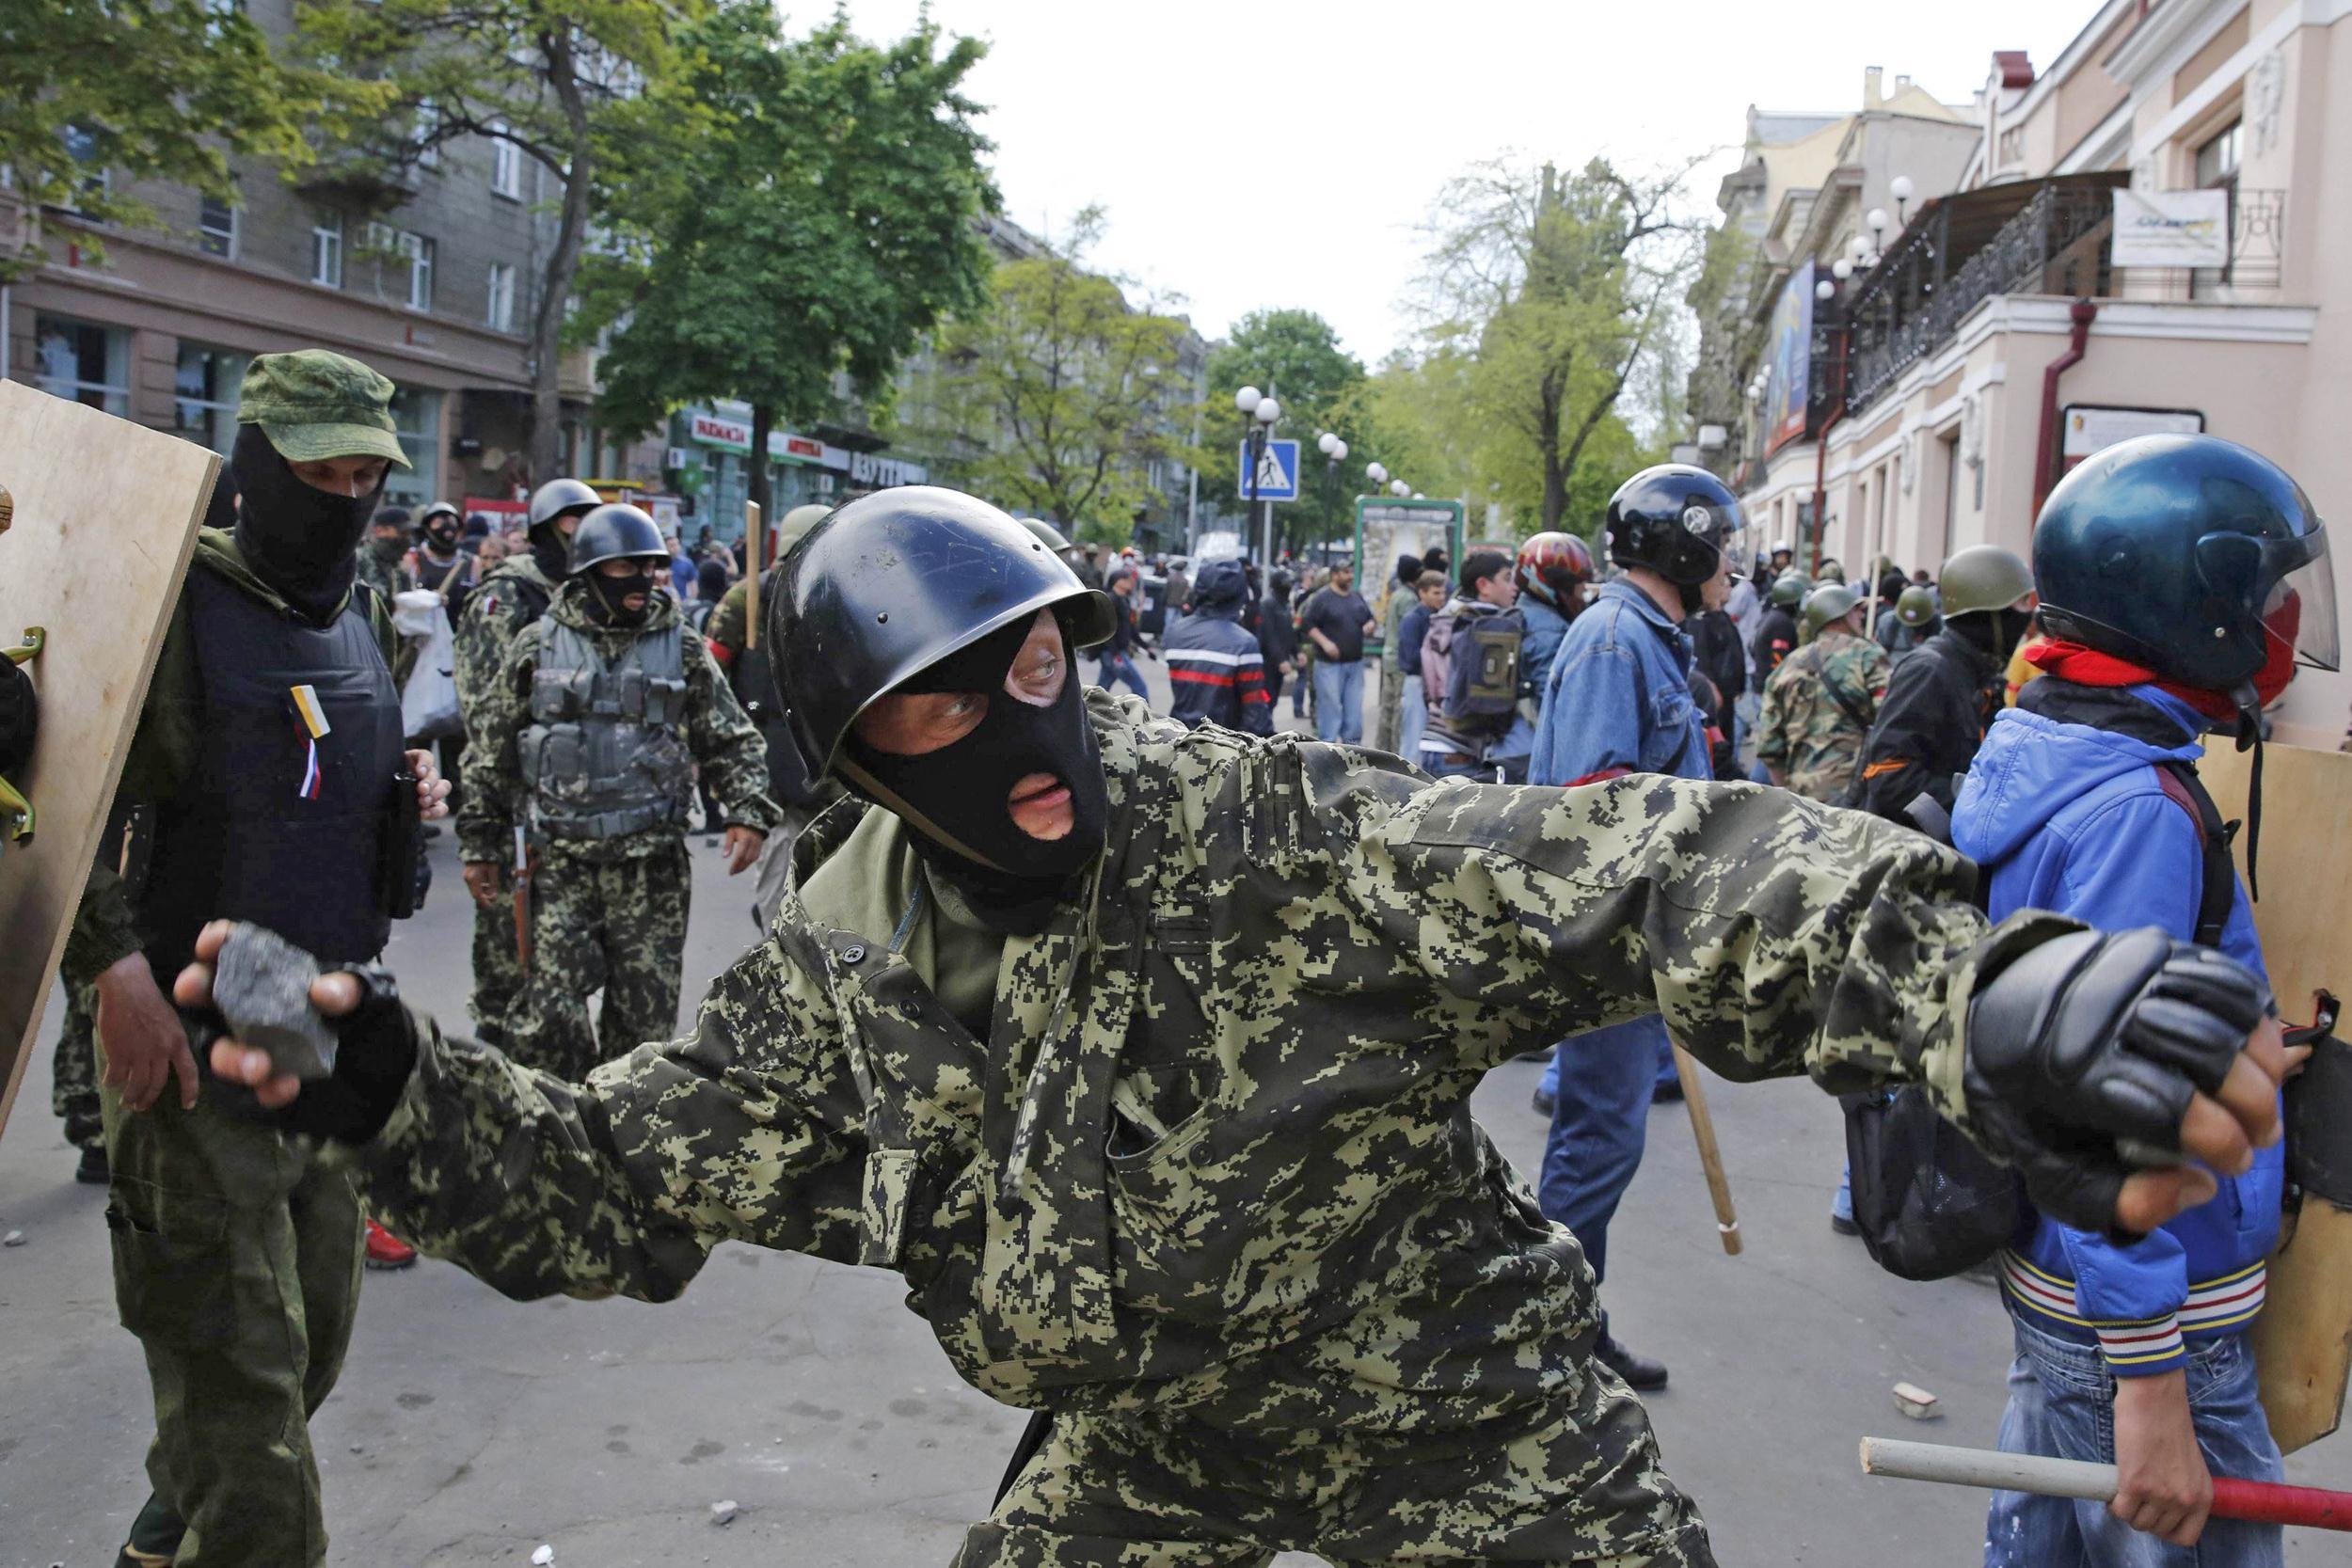 140502-odessa-protests-mn-1416_1b862a963f94bd6c315afd26d078f3b8